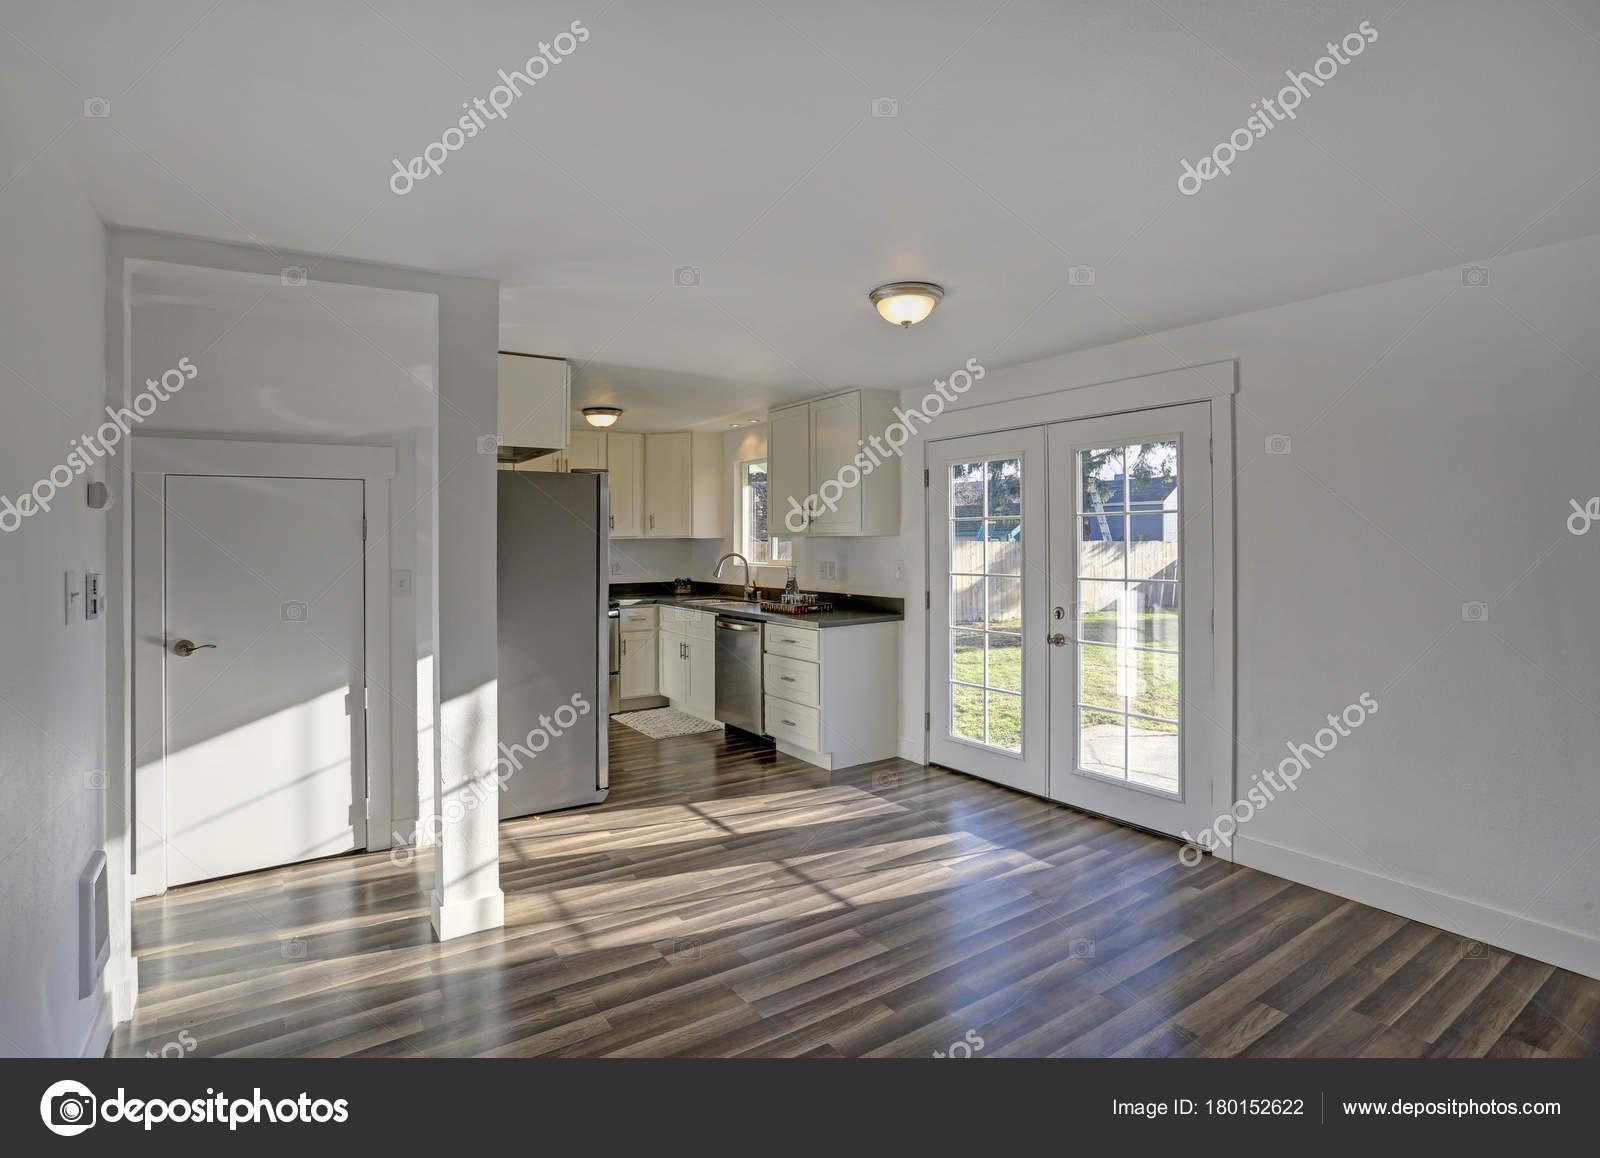 Sala da pranzo vuota. Puri bianchi pareti rendono la camera spaziosa ...